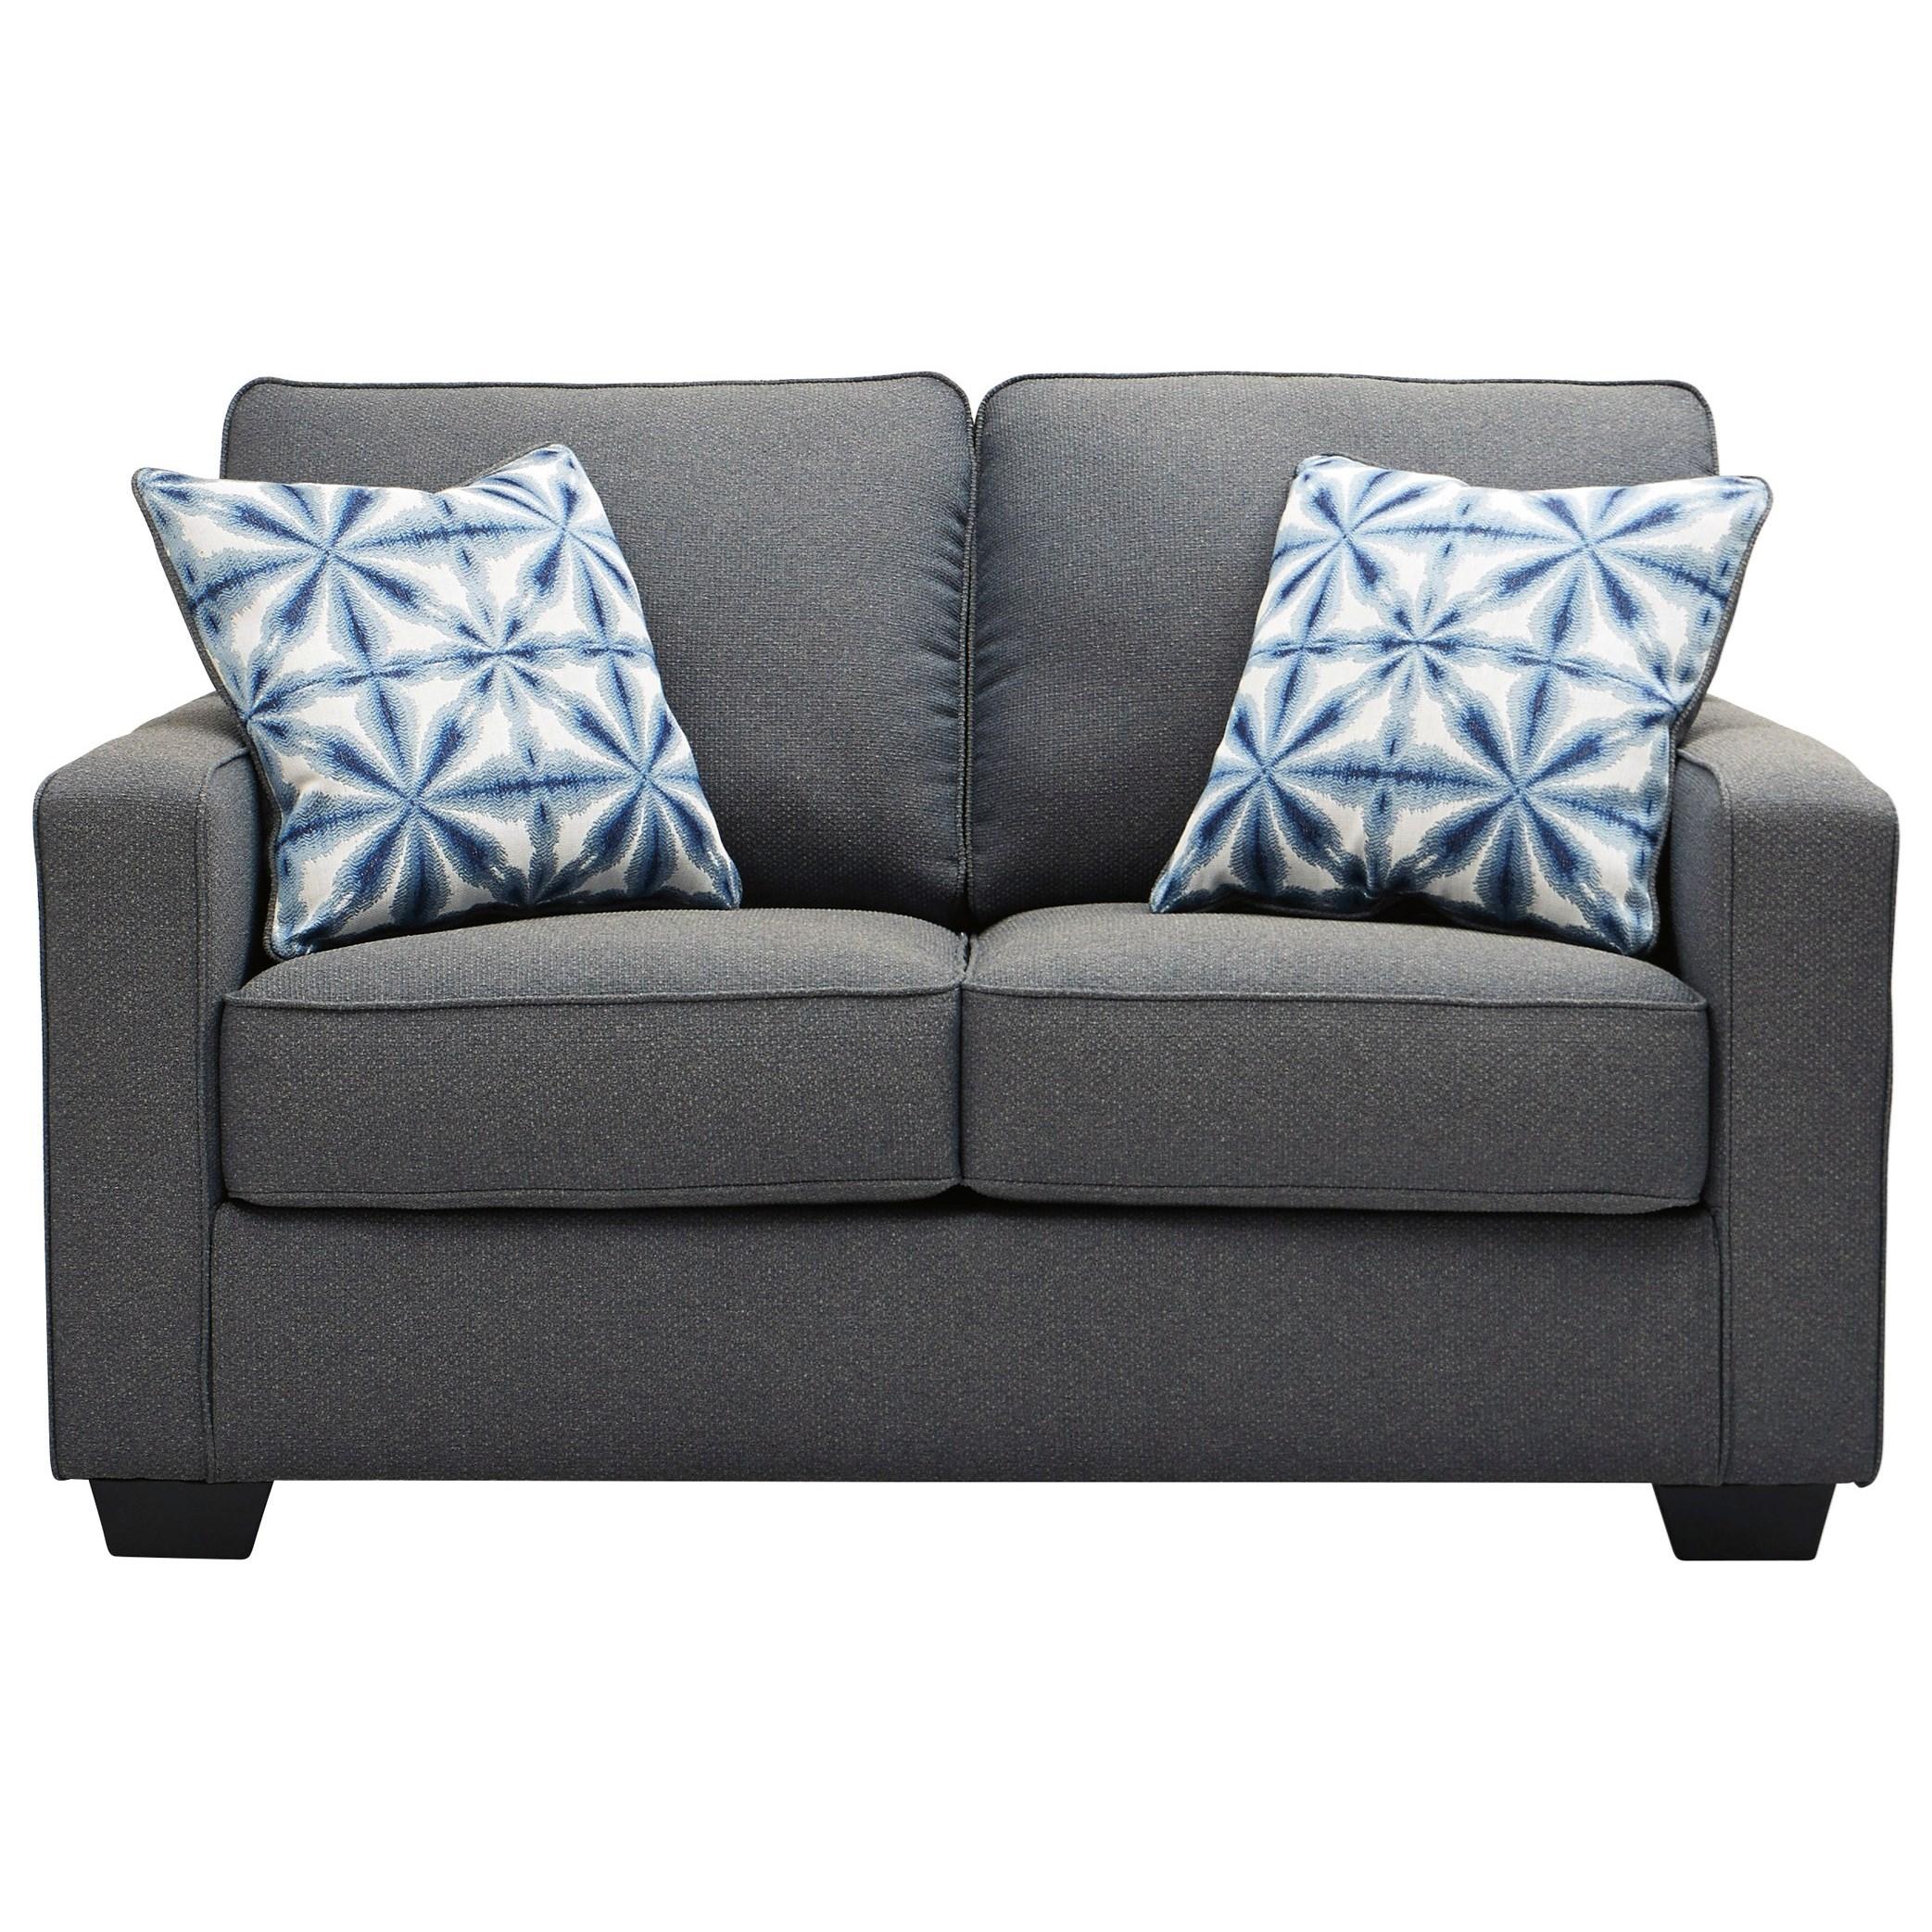 Kiessel Nuvella Loveseat by Benchcraft at HomeWorld Furniture